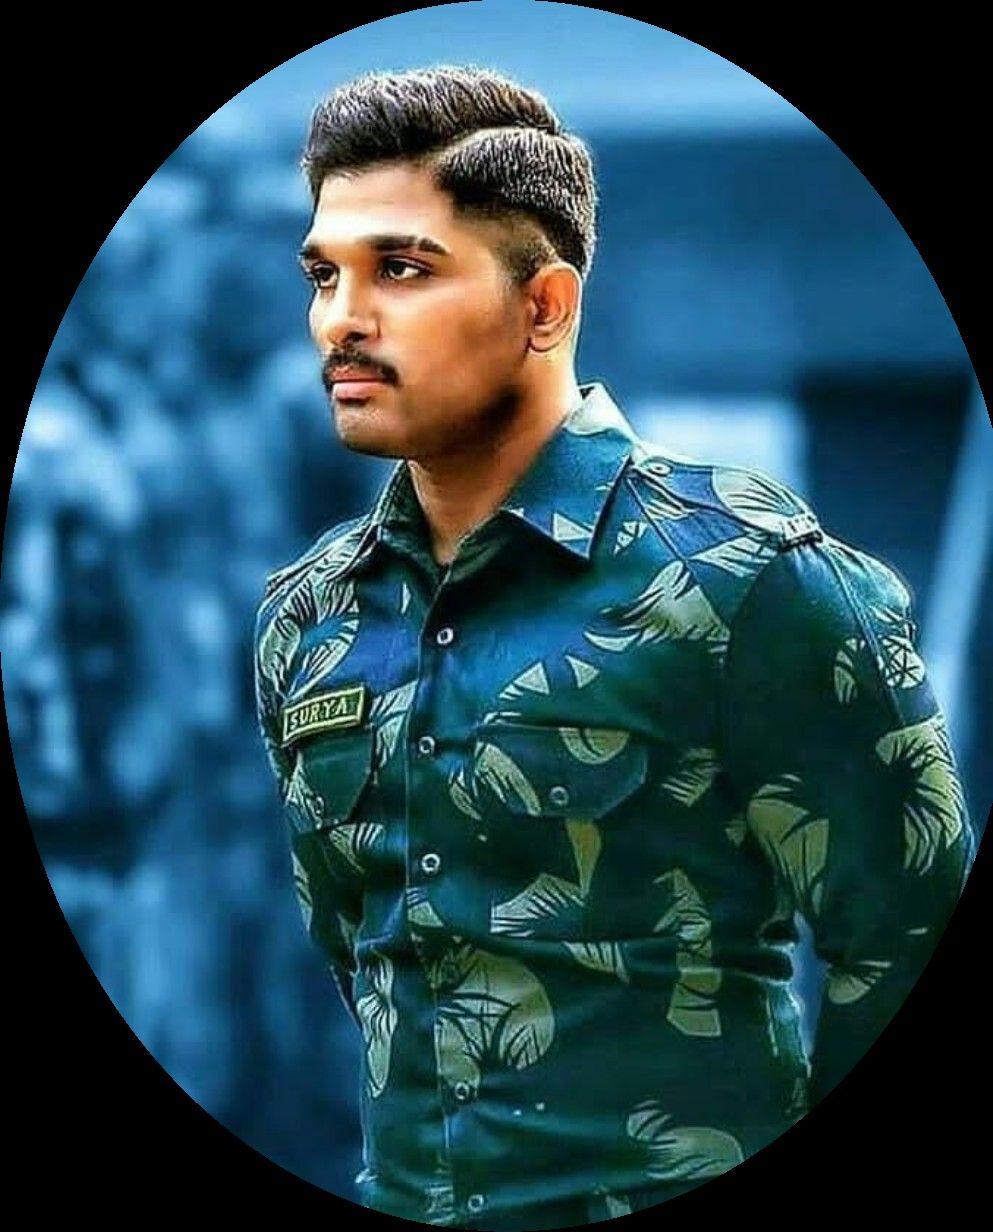 Allu arjun   Indian army wallpapers, Army wallpaper, Allu arjun ...